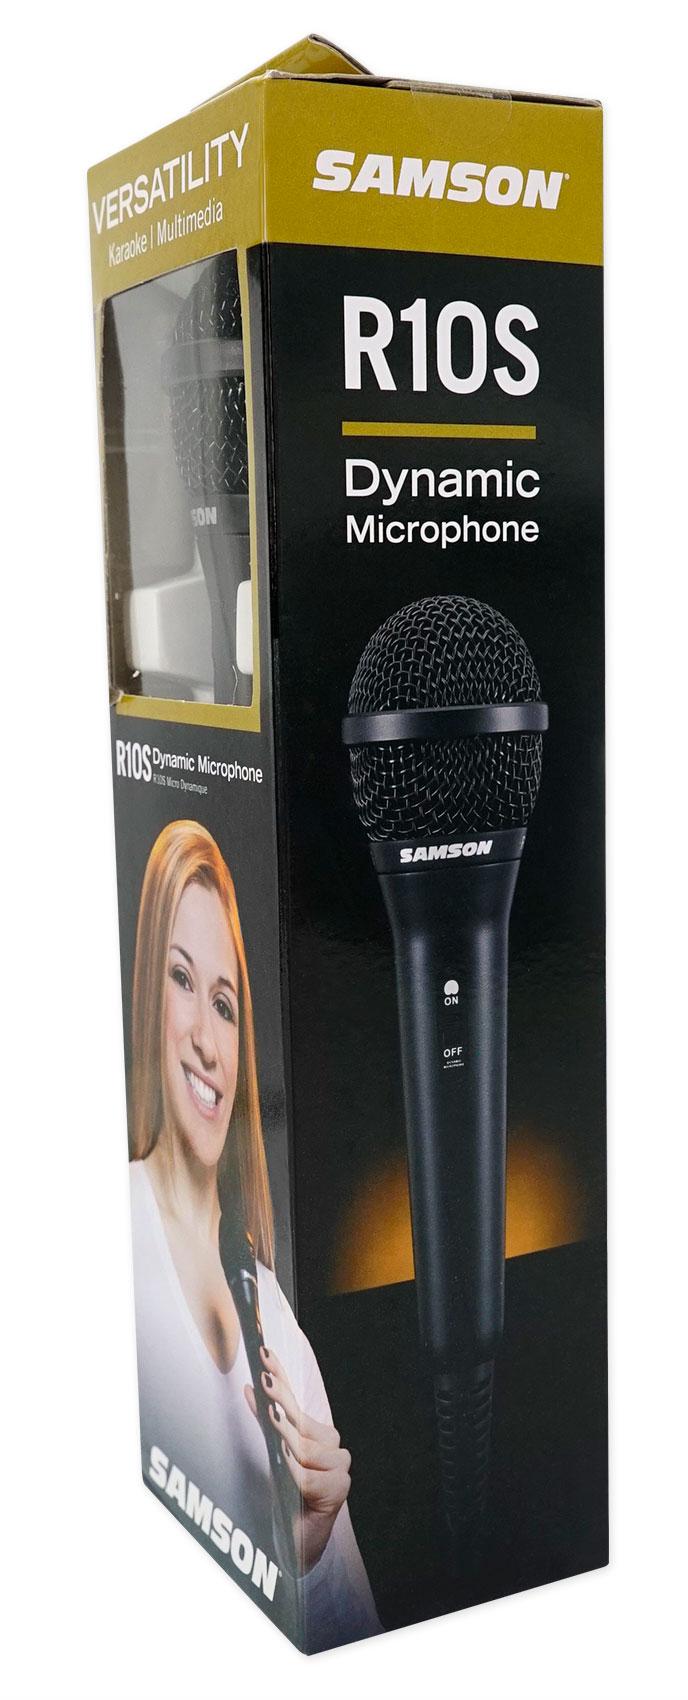 Details about Samson R10S Karaoke Microphone Neodymium Handheld Vocal Mic +  Desktop Stand